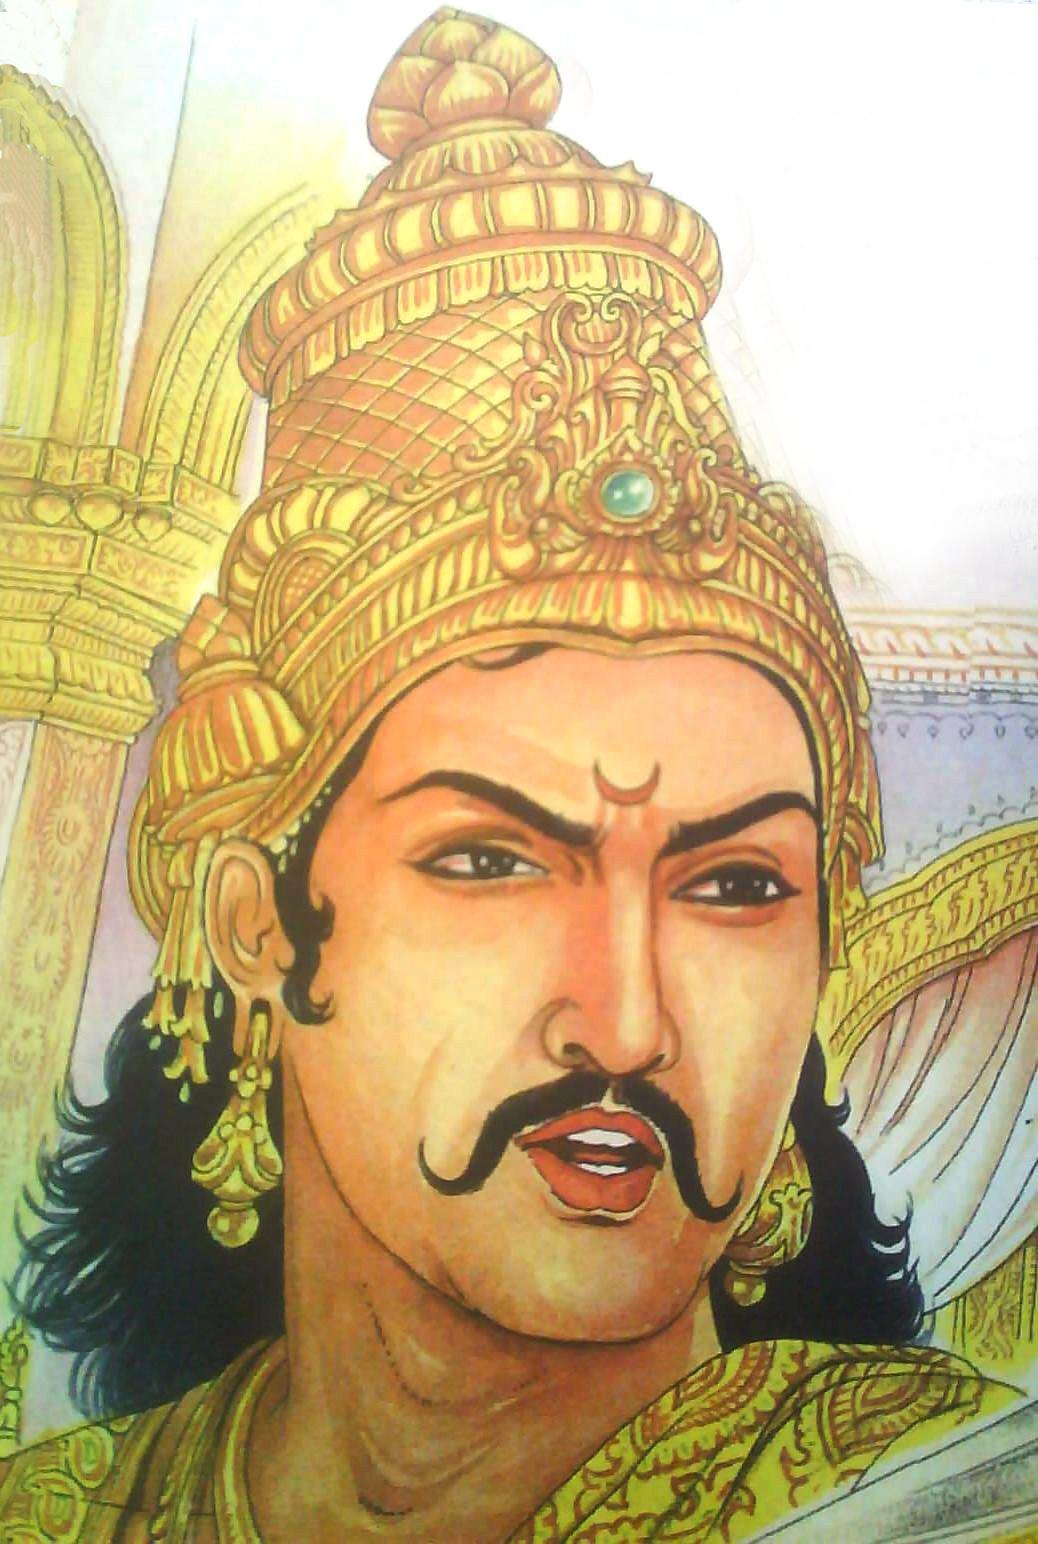 Chola Heritage: Ponniyin Selvan - Kalki The real hero